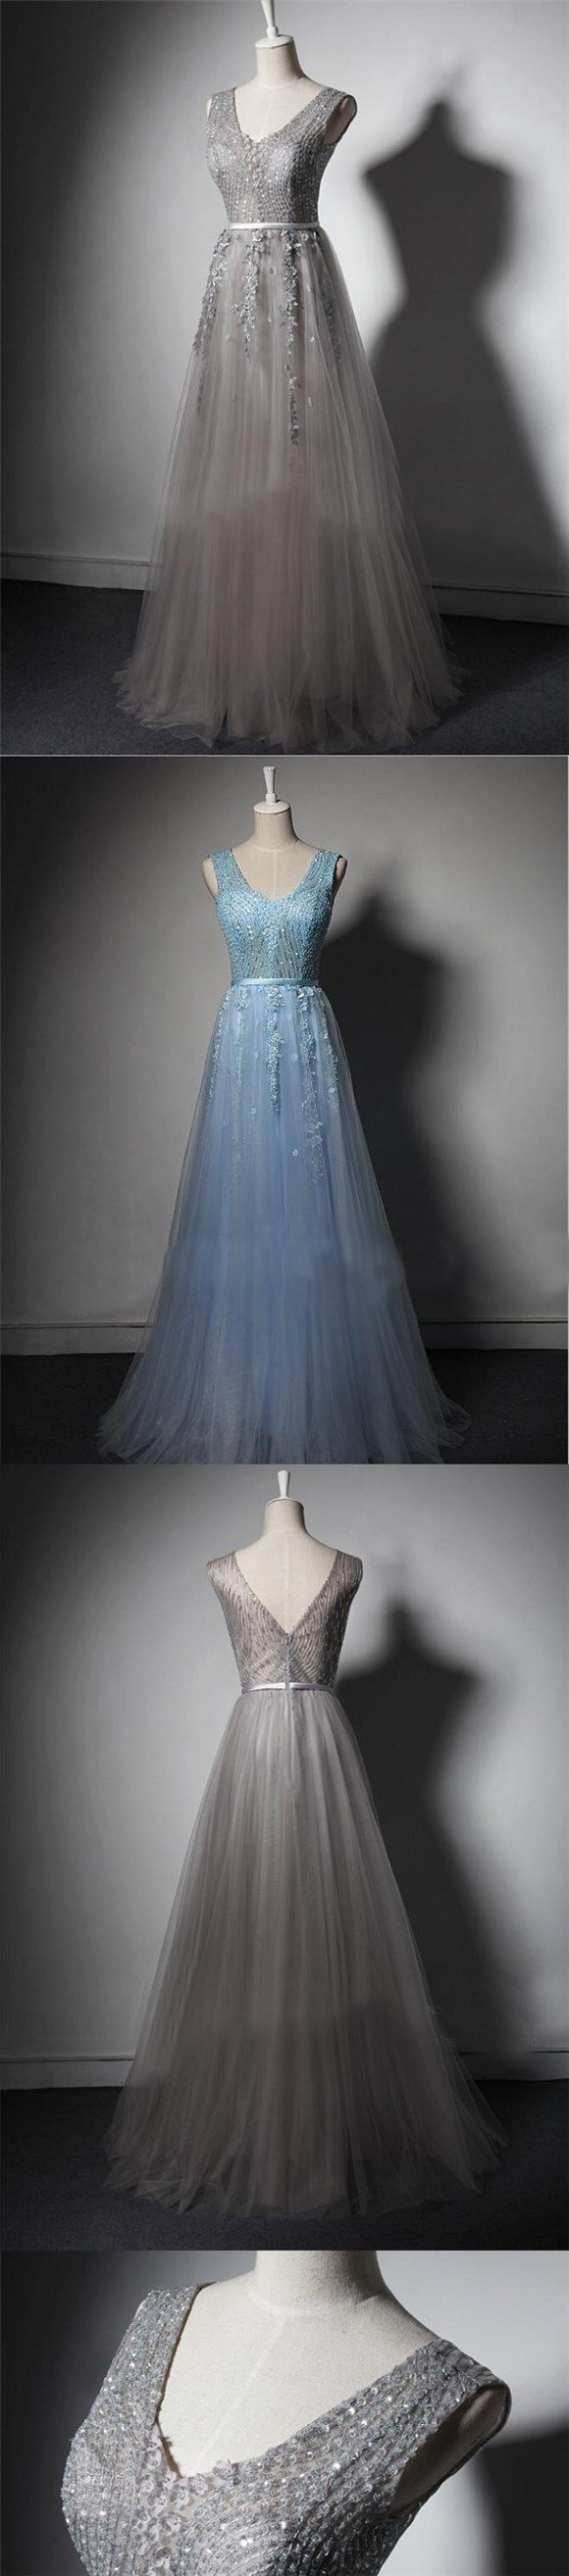 Beading Shining Gorgeous Custom Fashion Formal Modest Prom Dress, Elegant Bridesmaid Dress , PD0390 #modestprom